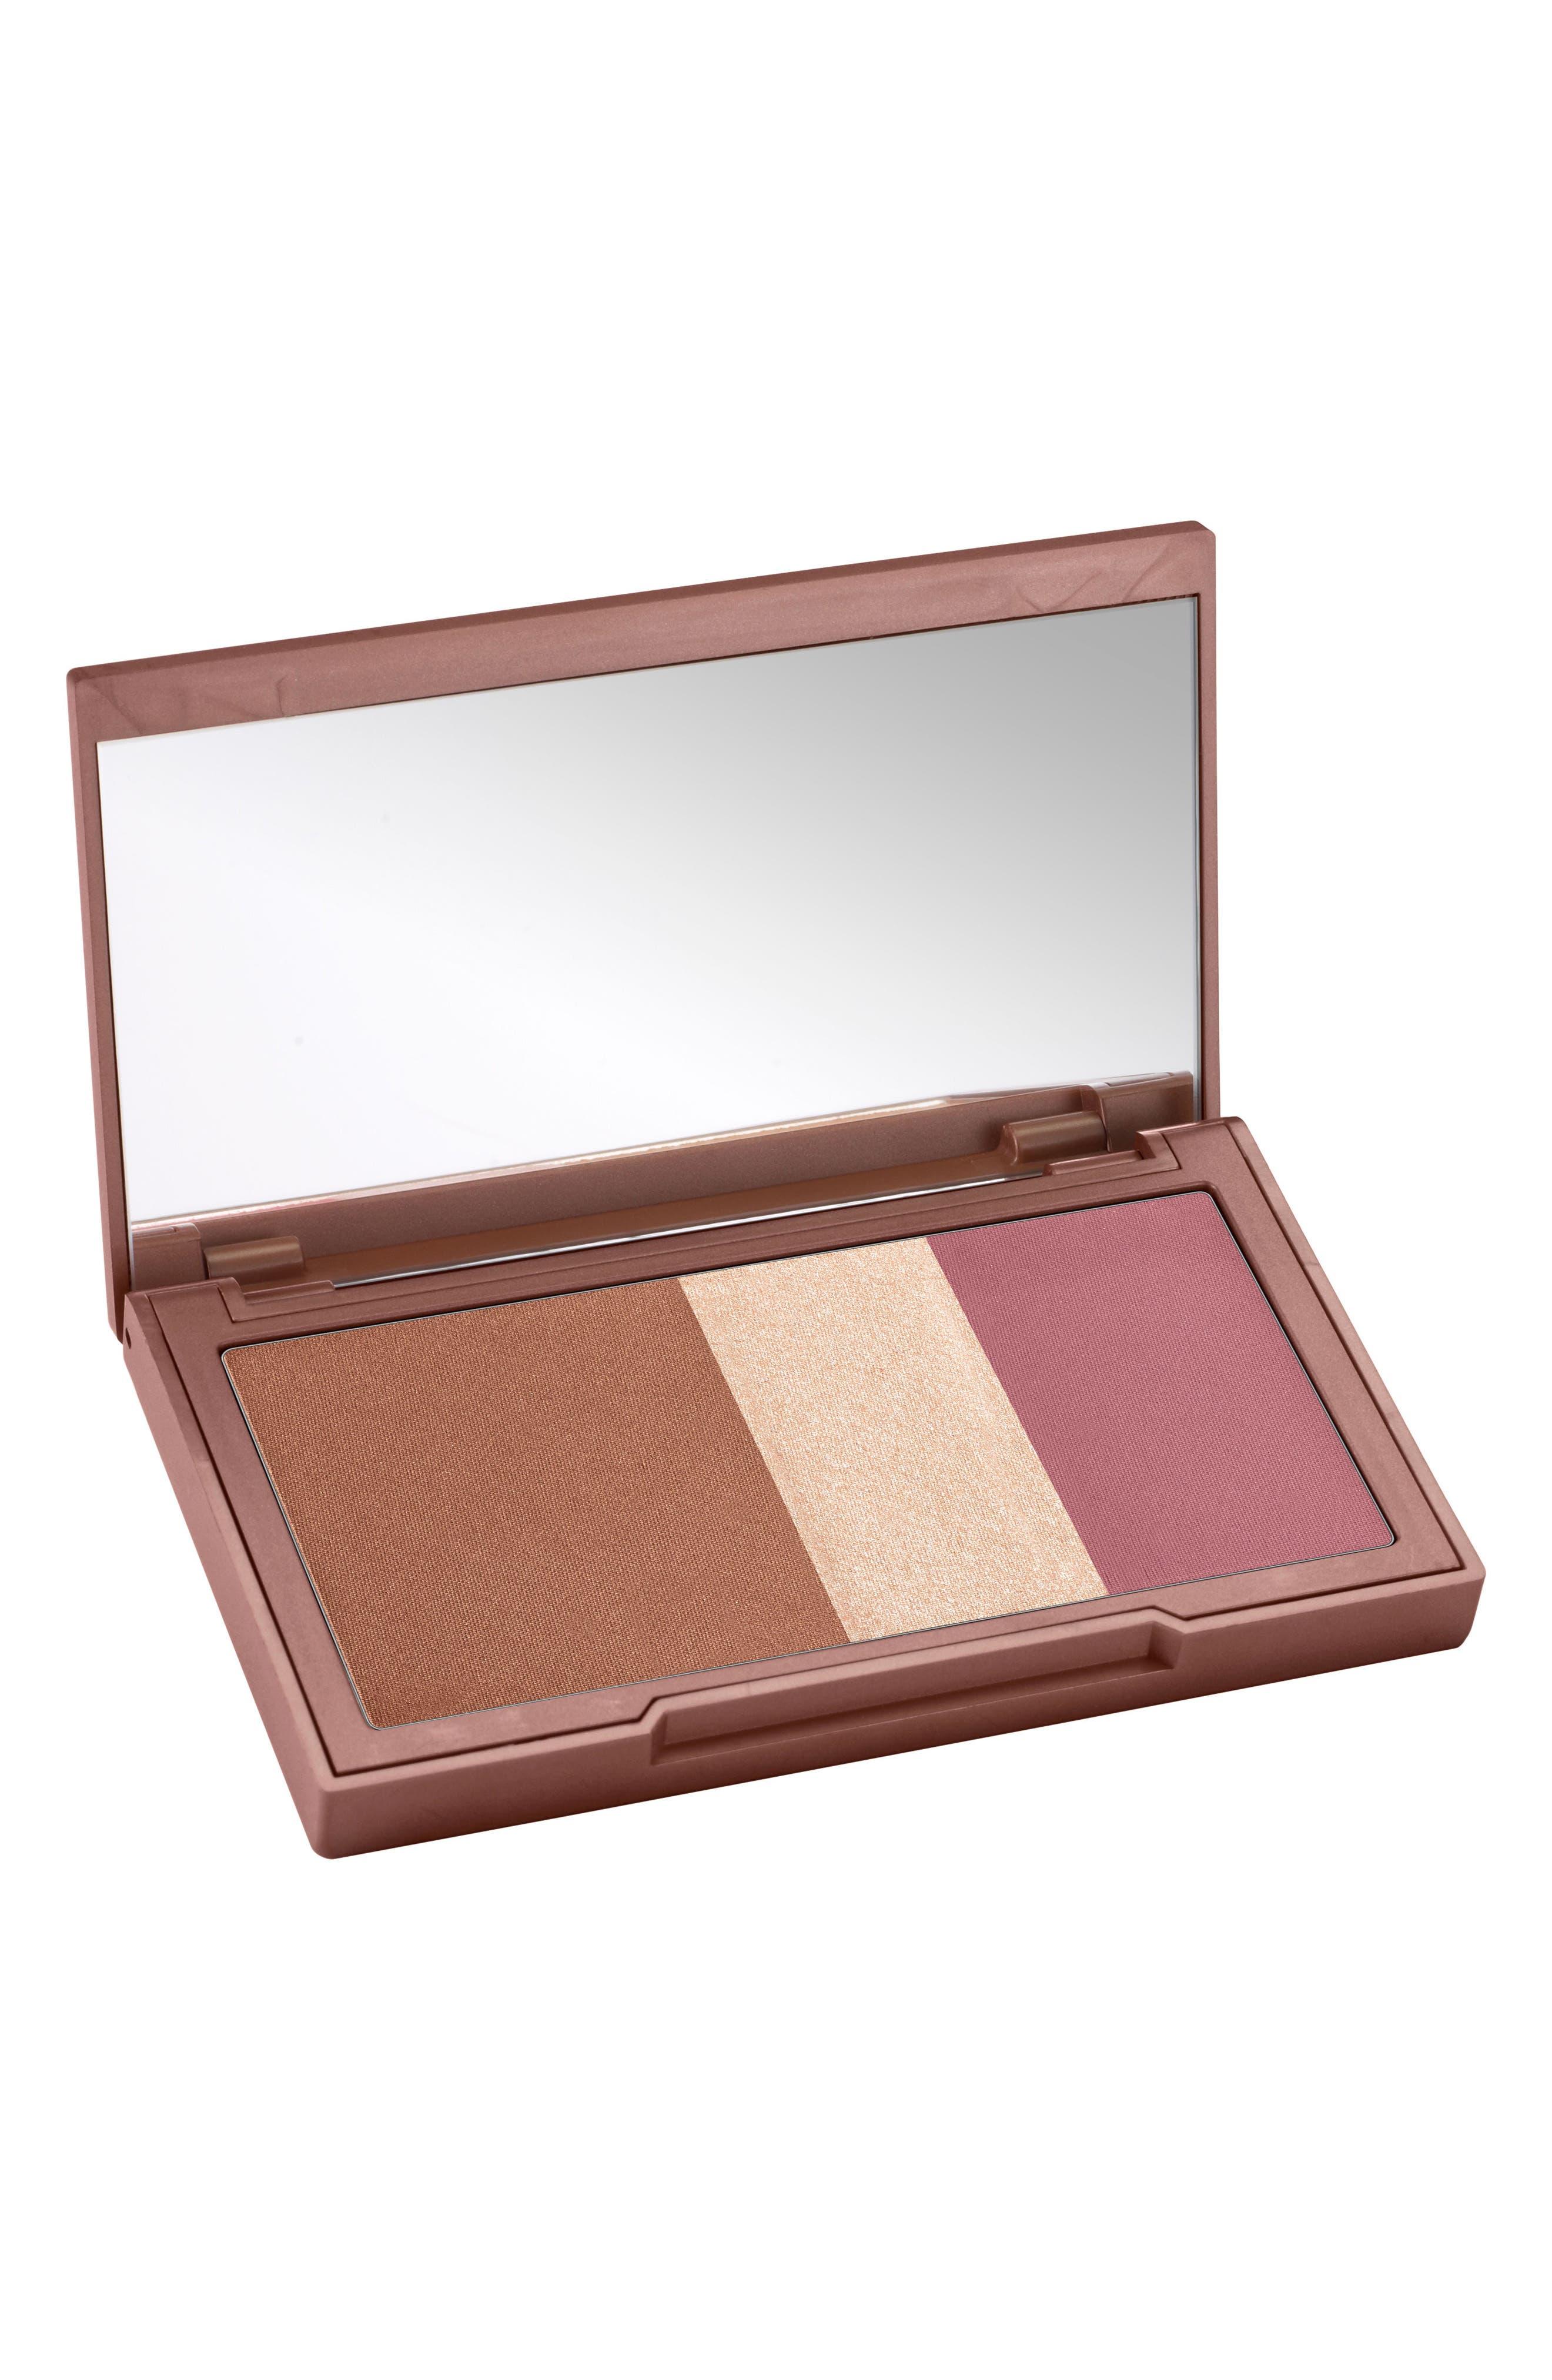 Naked Flushed Bronzer, Highlighter & Blush Palette,                             Main thumbnail 1, color,                             SESSO